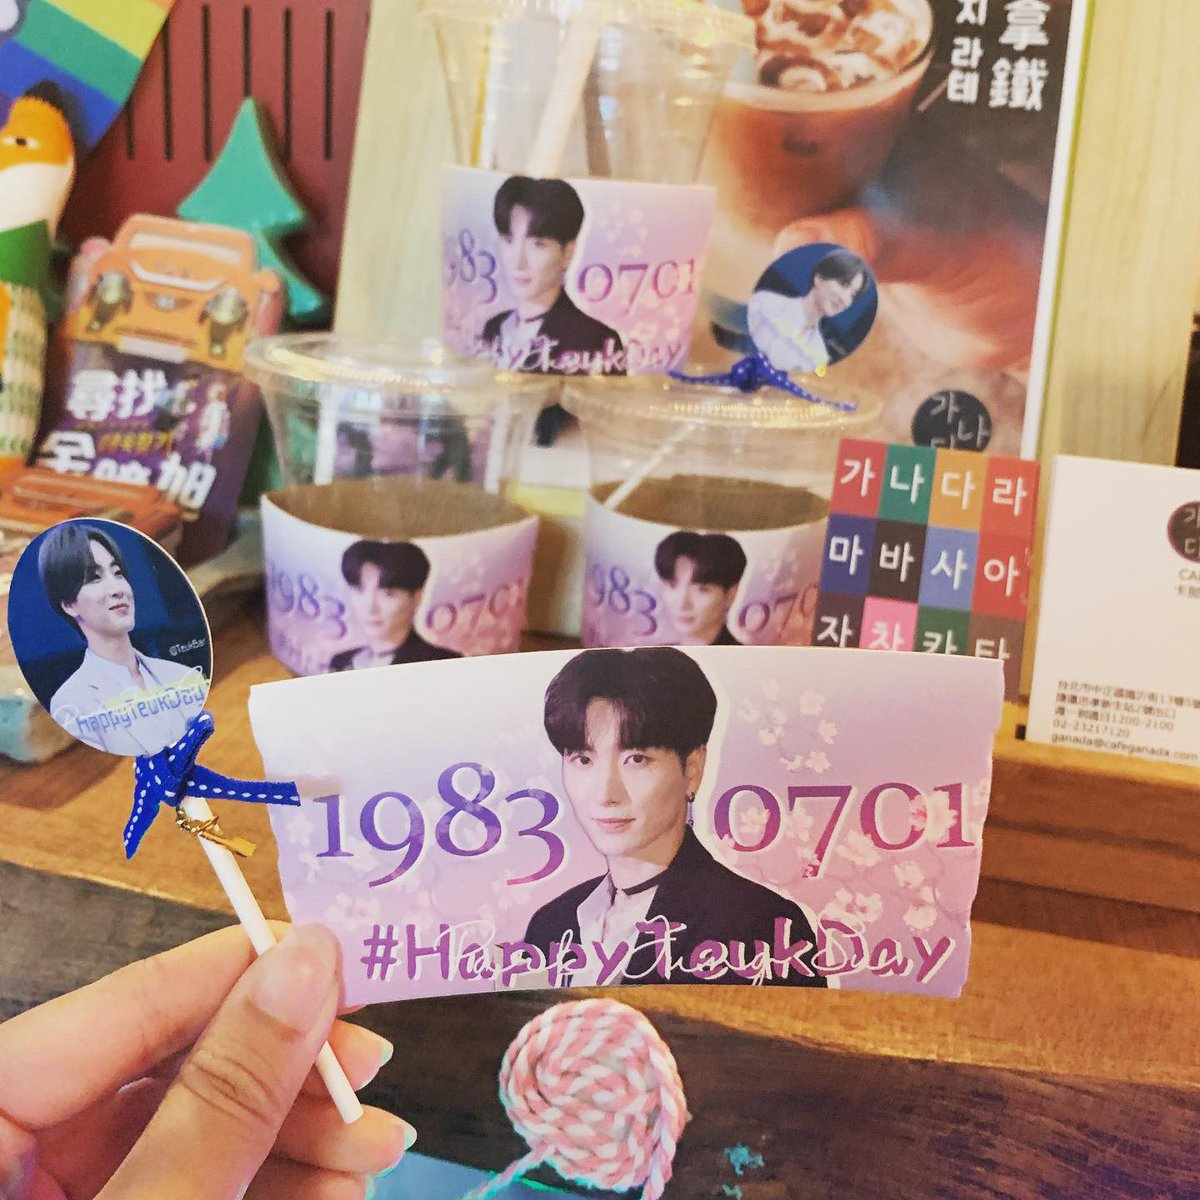 190701  Taiwan l🇹🇼  Happy Birthday to Leeteuk 也請記得好好照顧身體 몸도 잘 챙겨주세요  #HAPPYTEUKDAY  #이특생일축하해요  #利特生日快樂  @teuk_bar  @teukbar_taiwan @special1004